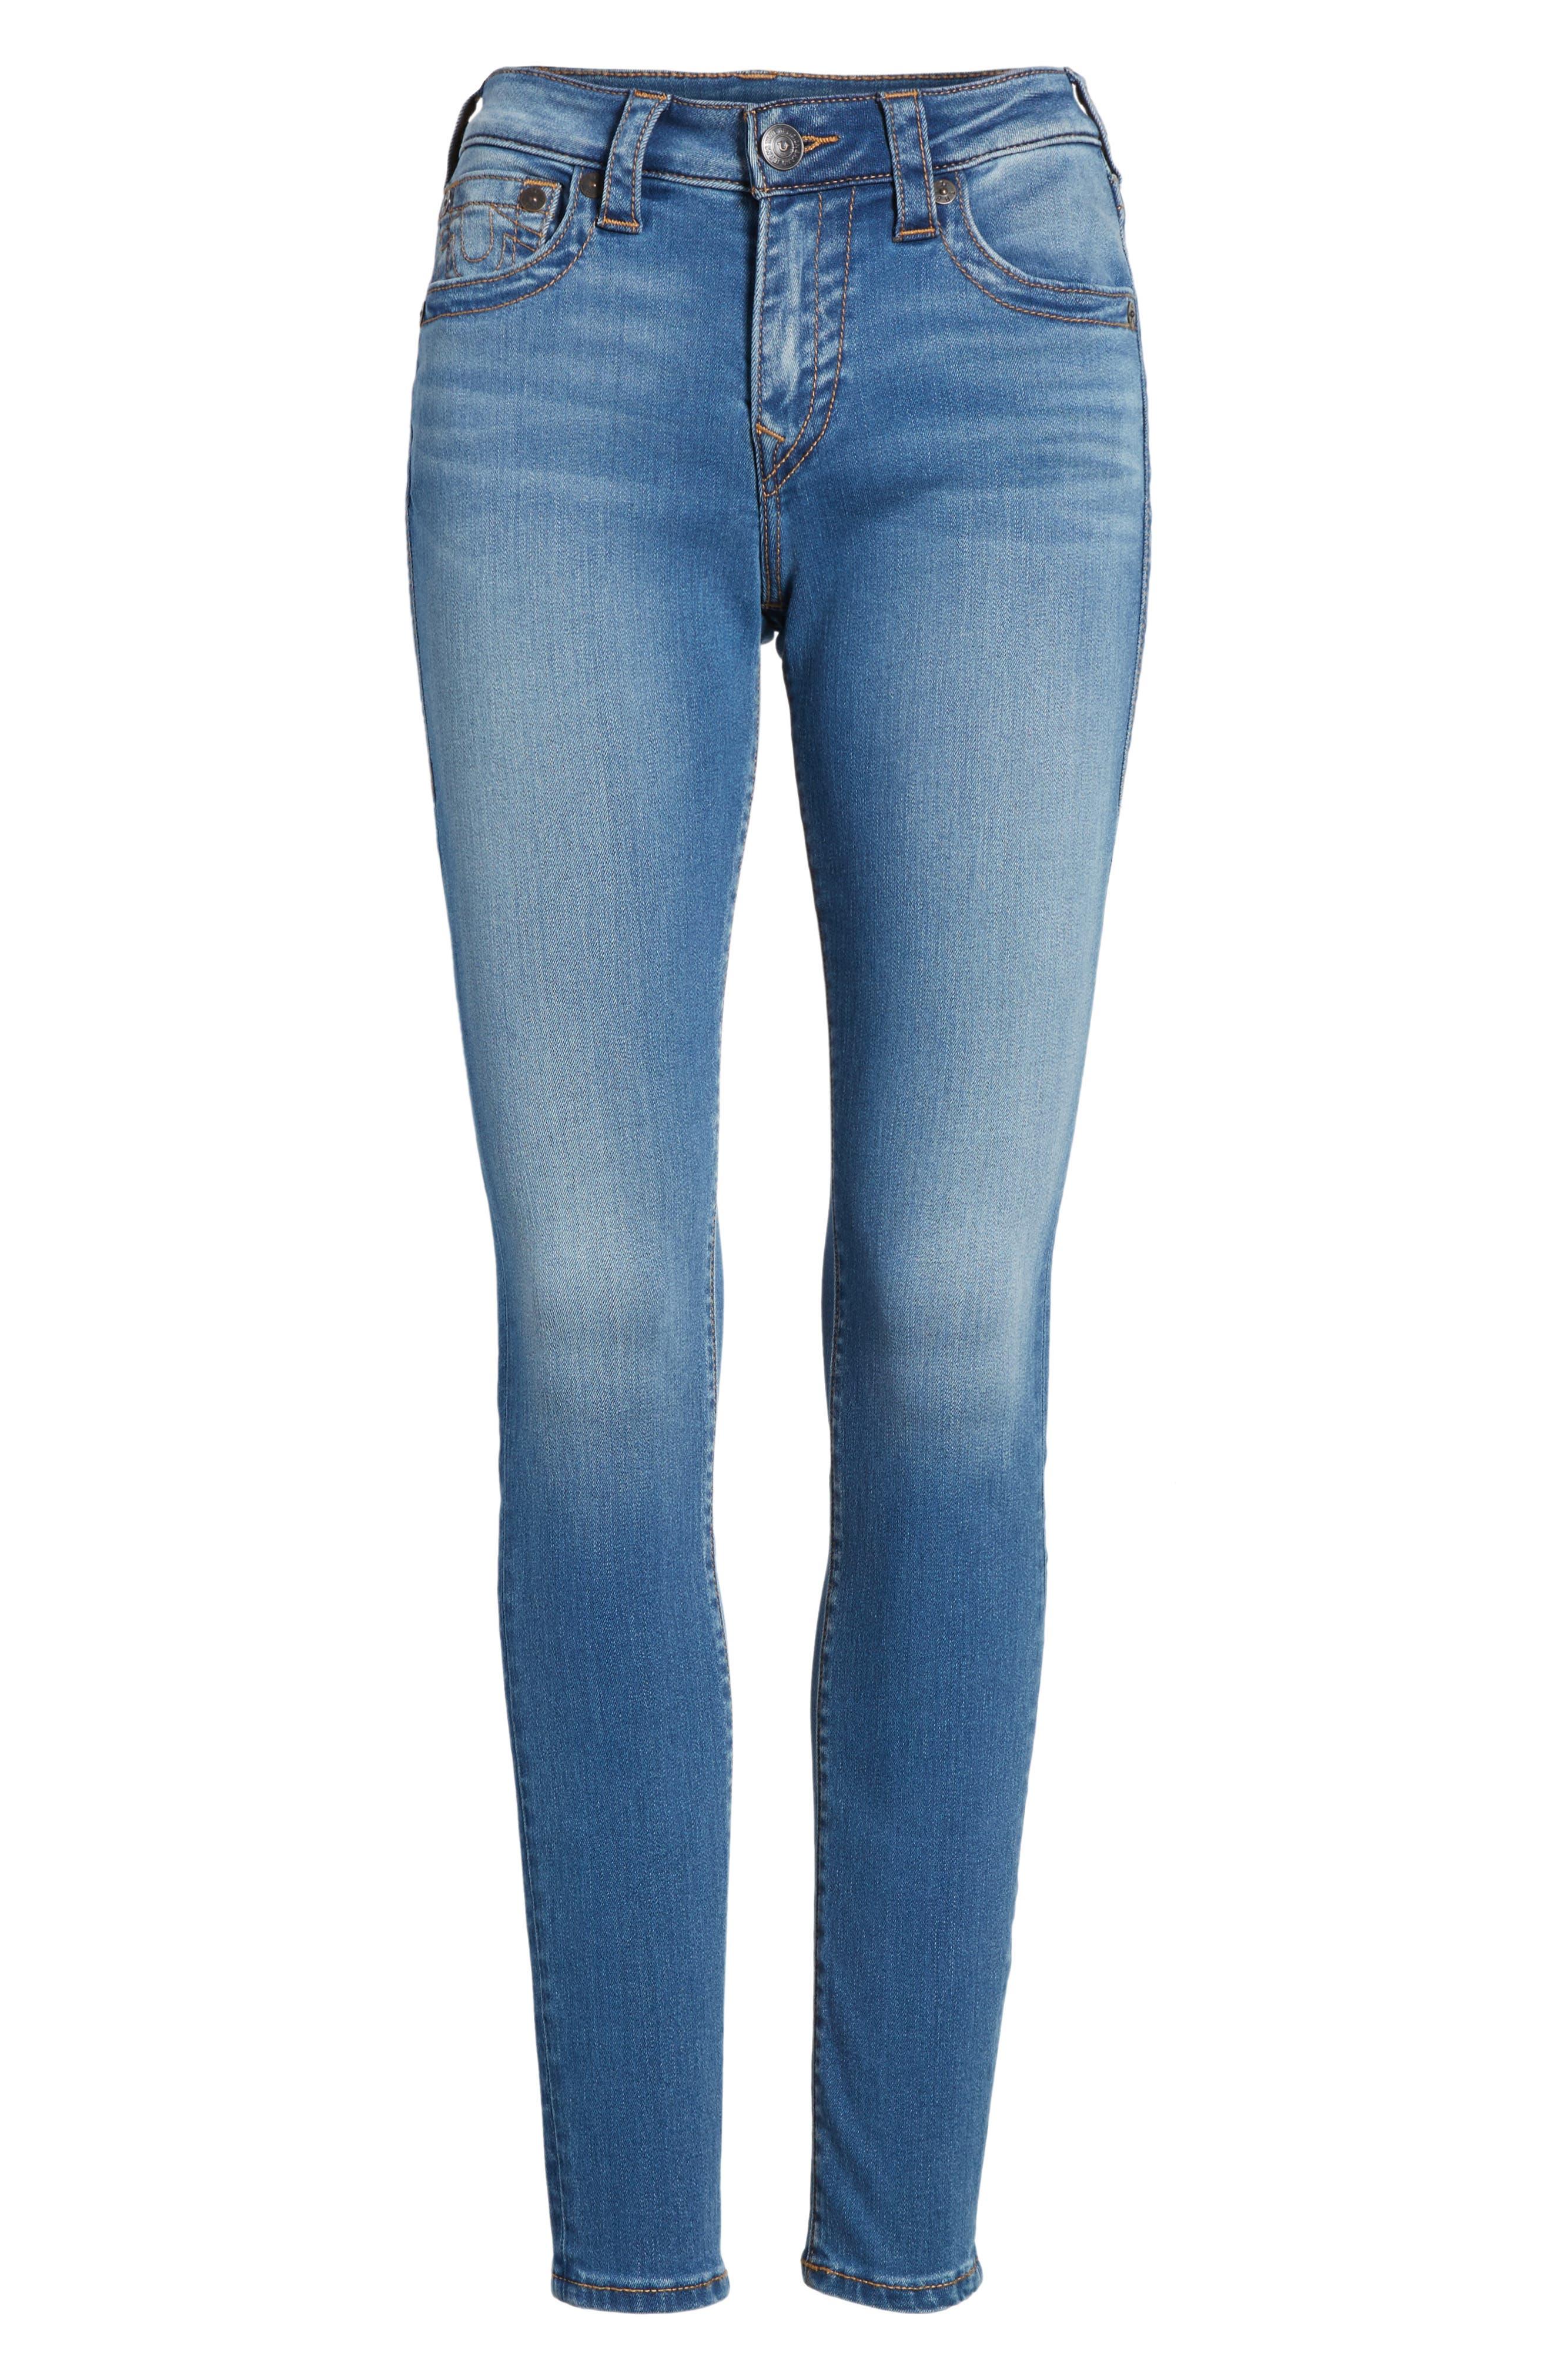 Jennie Curvy Skinny Jeans,                             Alternate thumbnail 6, color,                             Nu Authentic Indigo